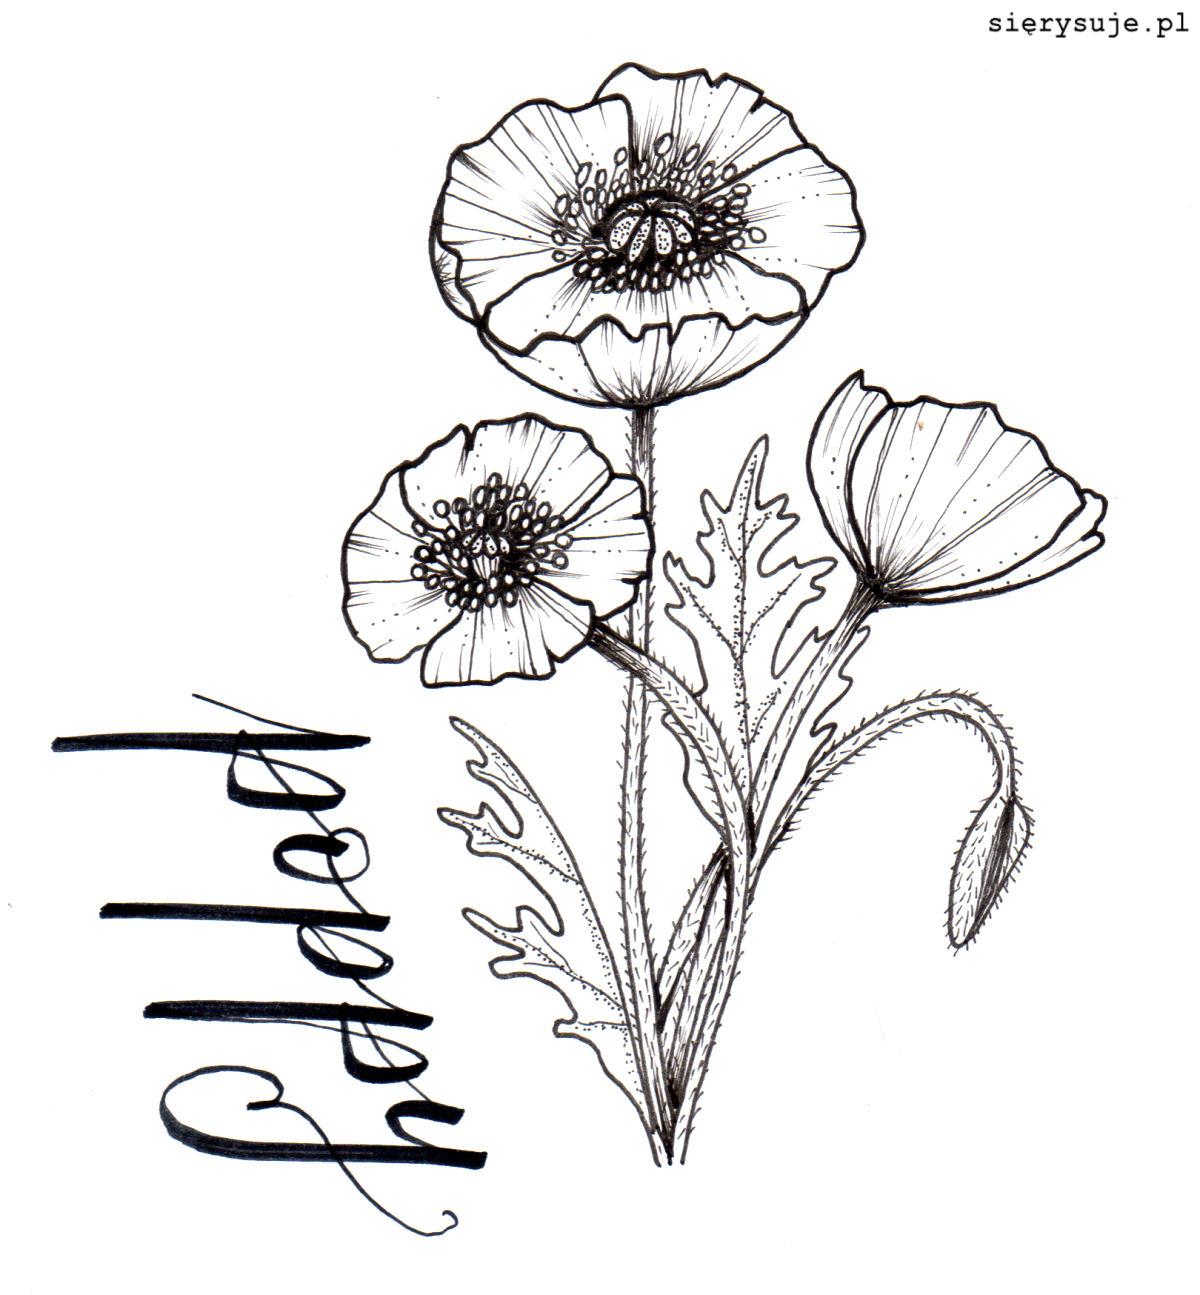 sierysuje.pl line drawing rysunek botaniczny mak polny